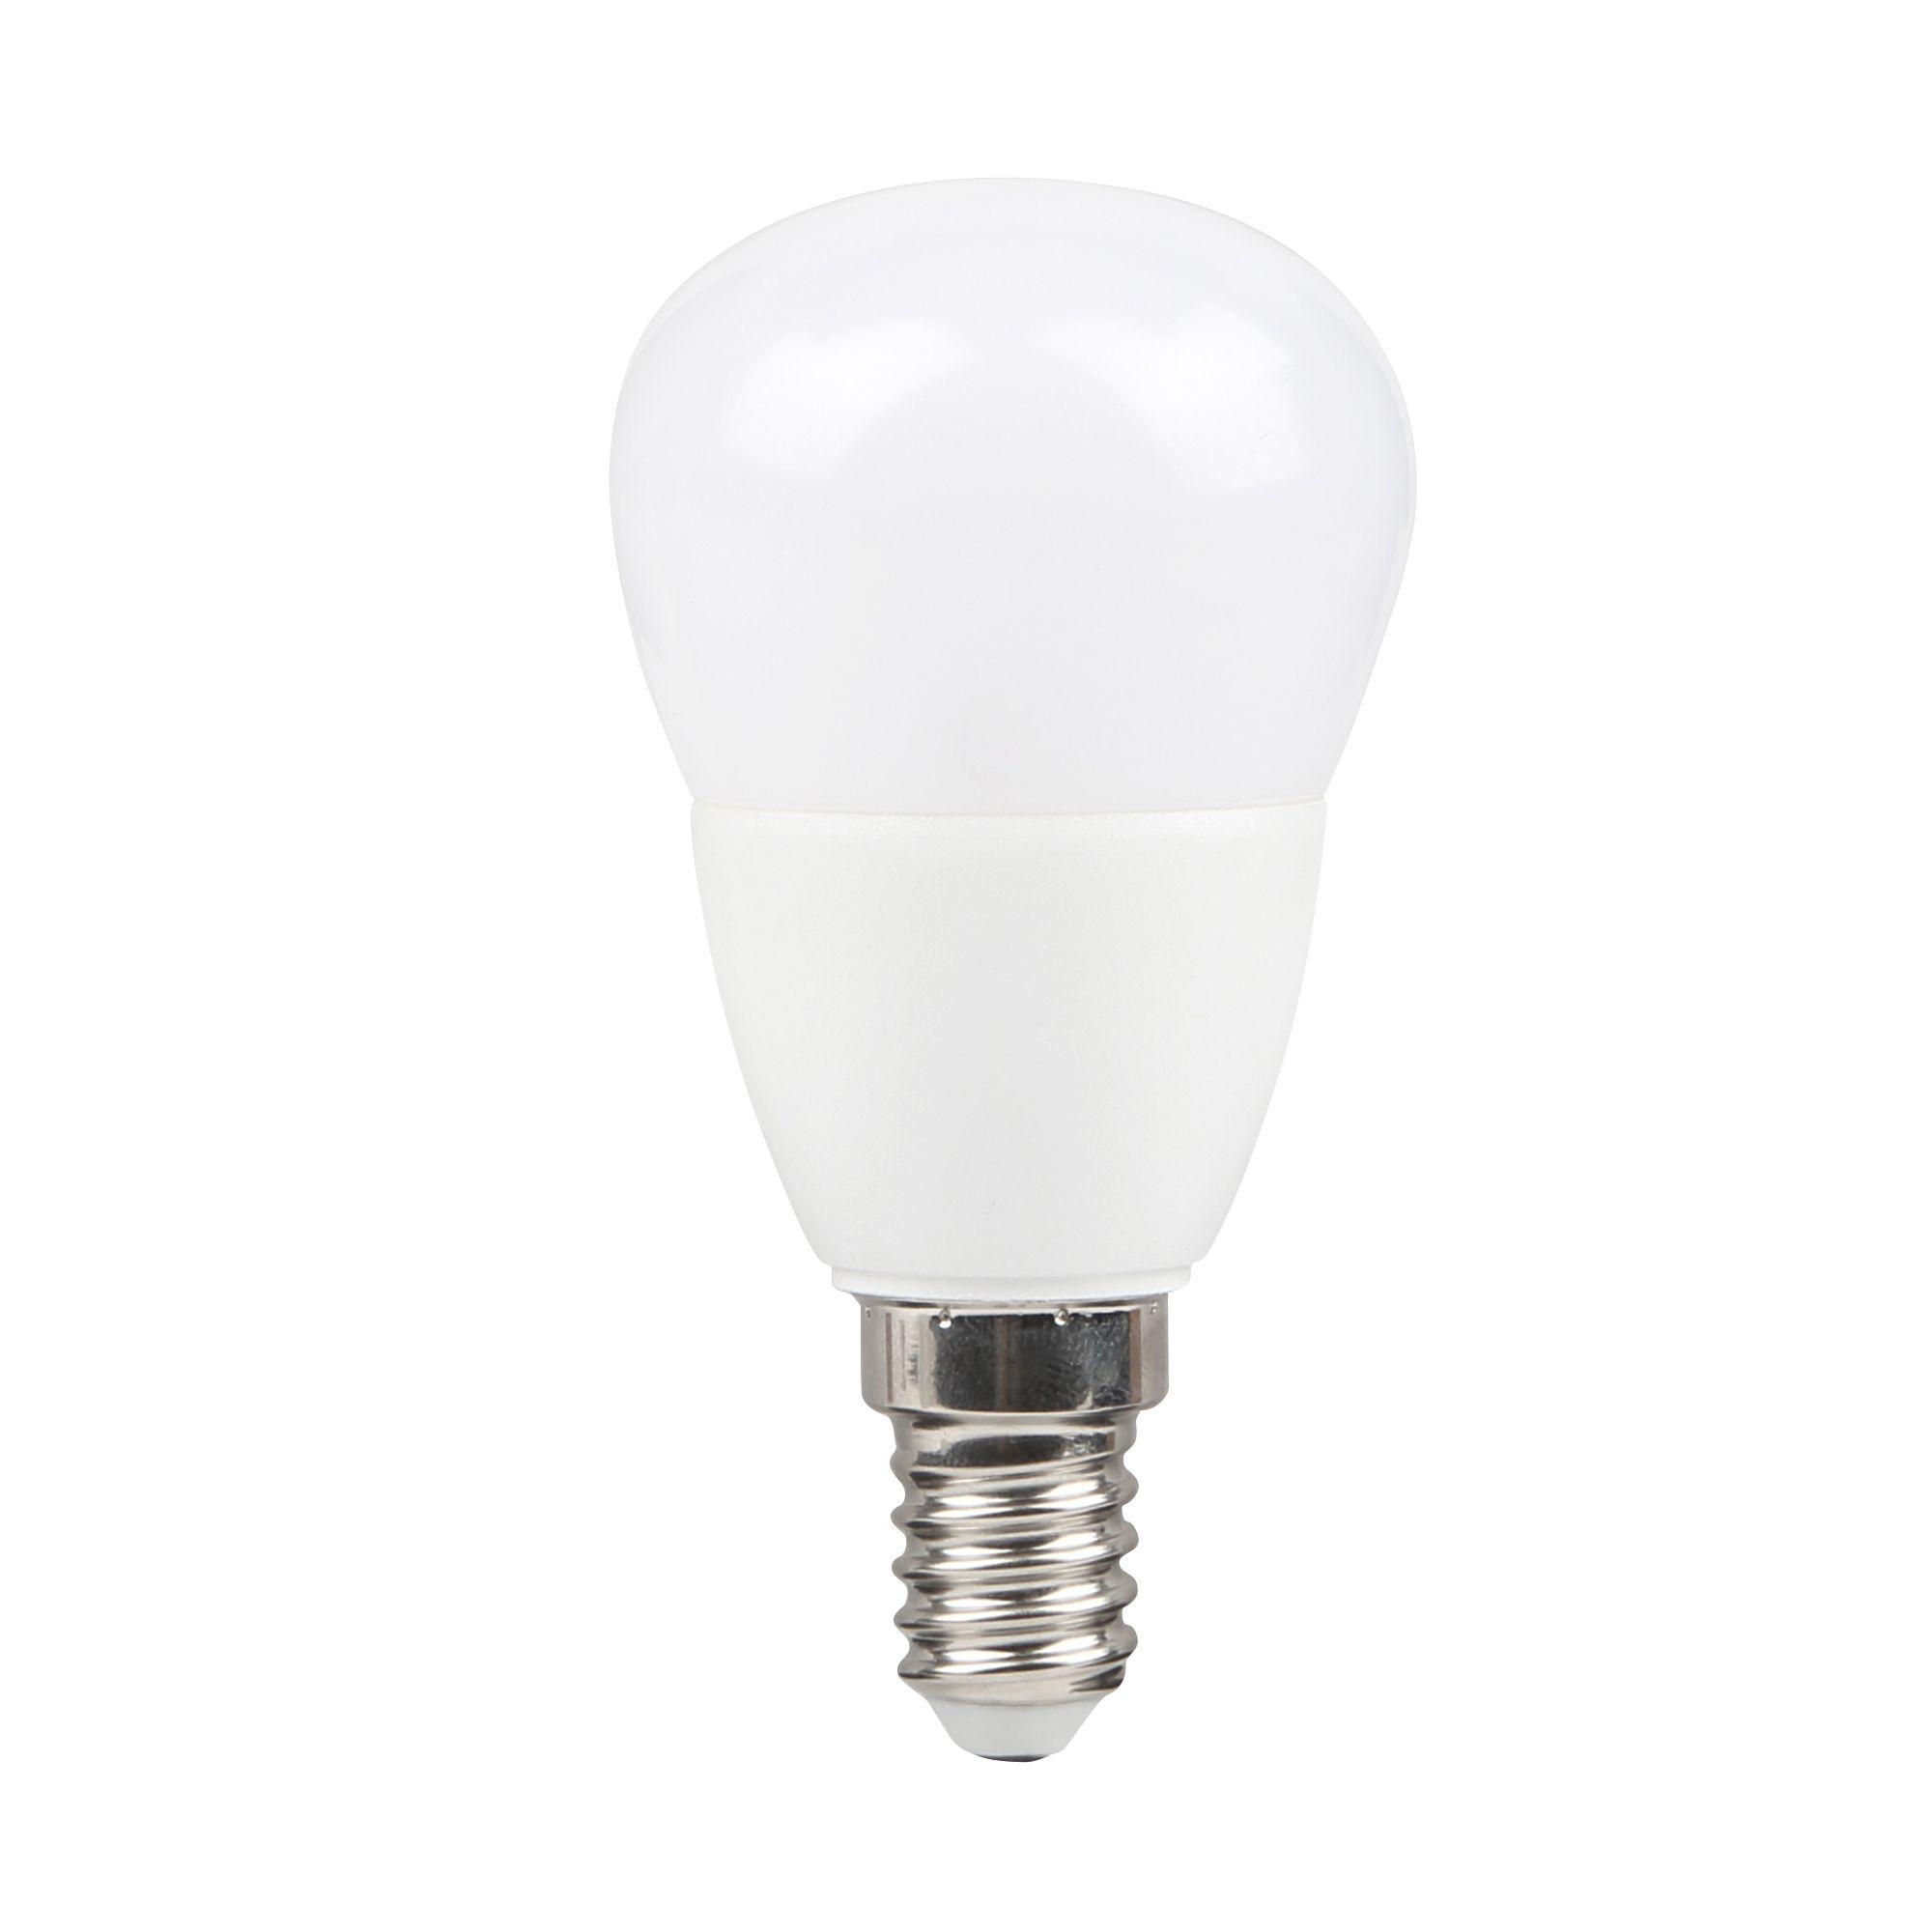 Diall E14 470lm LED Ball Light Bulb | Departments